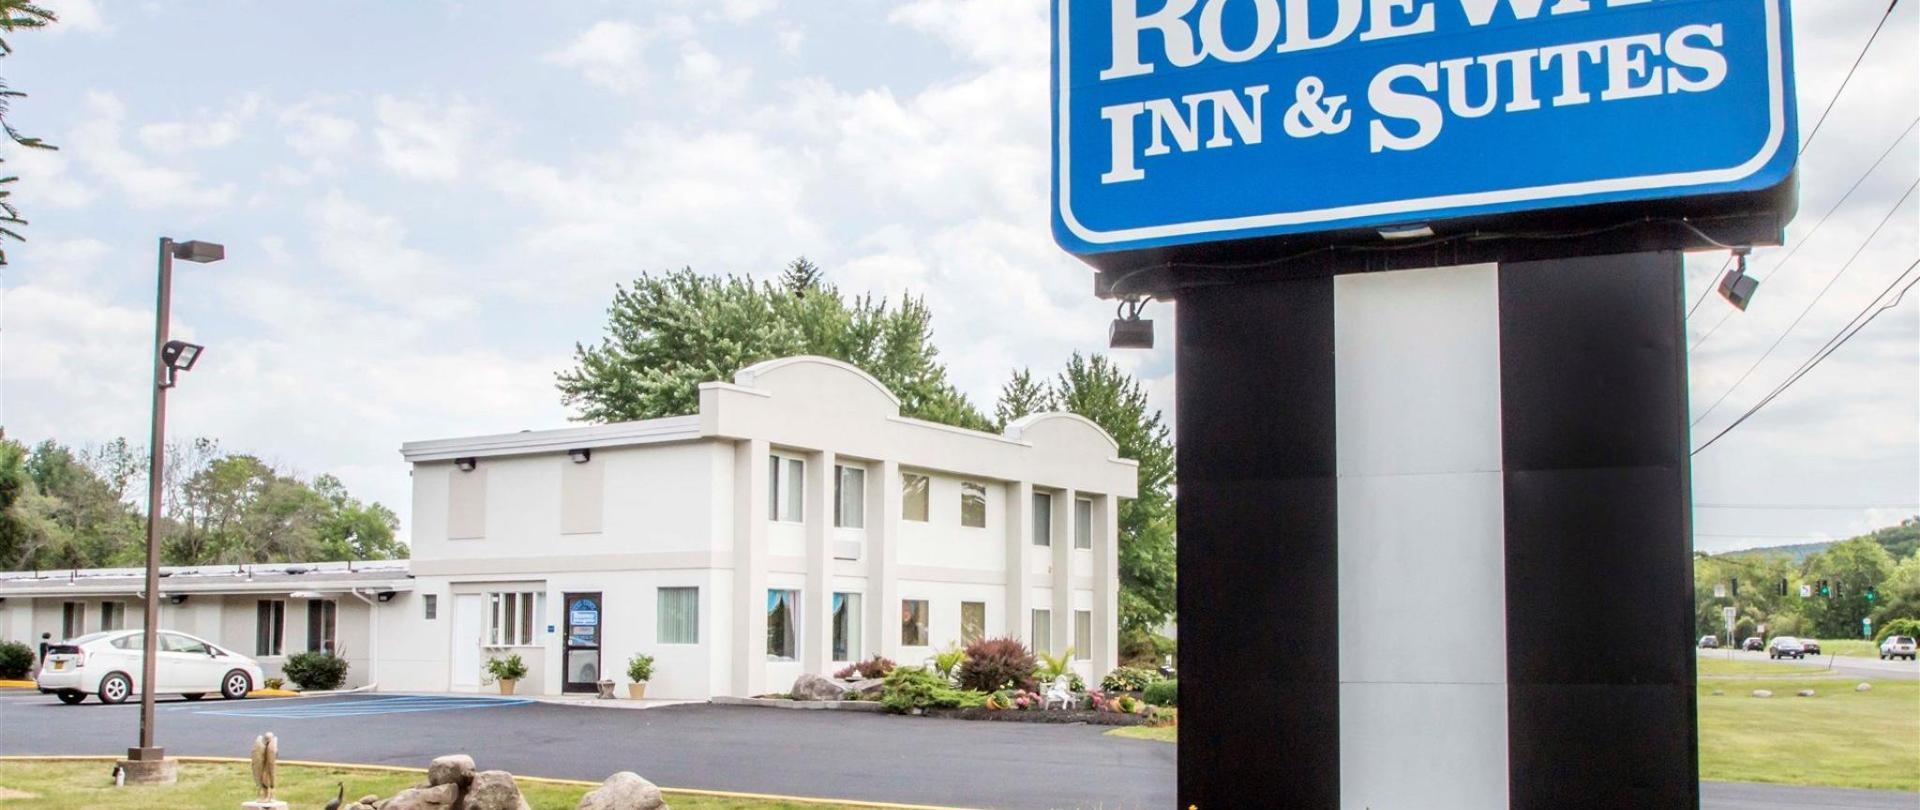 Rodeway Inn & Suites New Paltz Board Sign